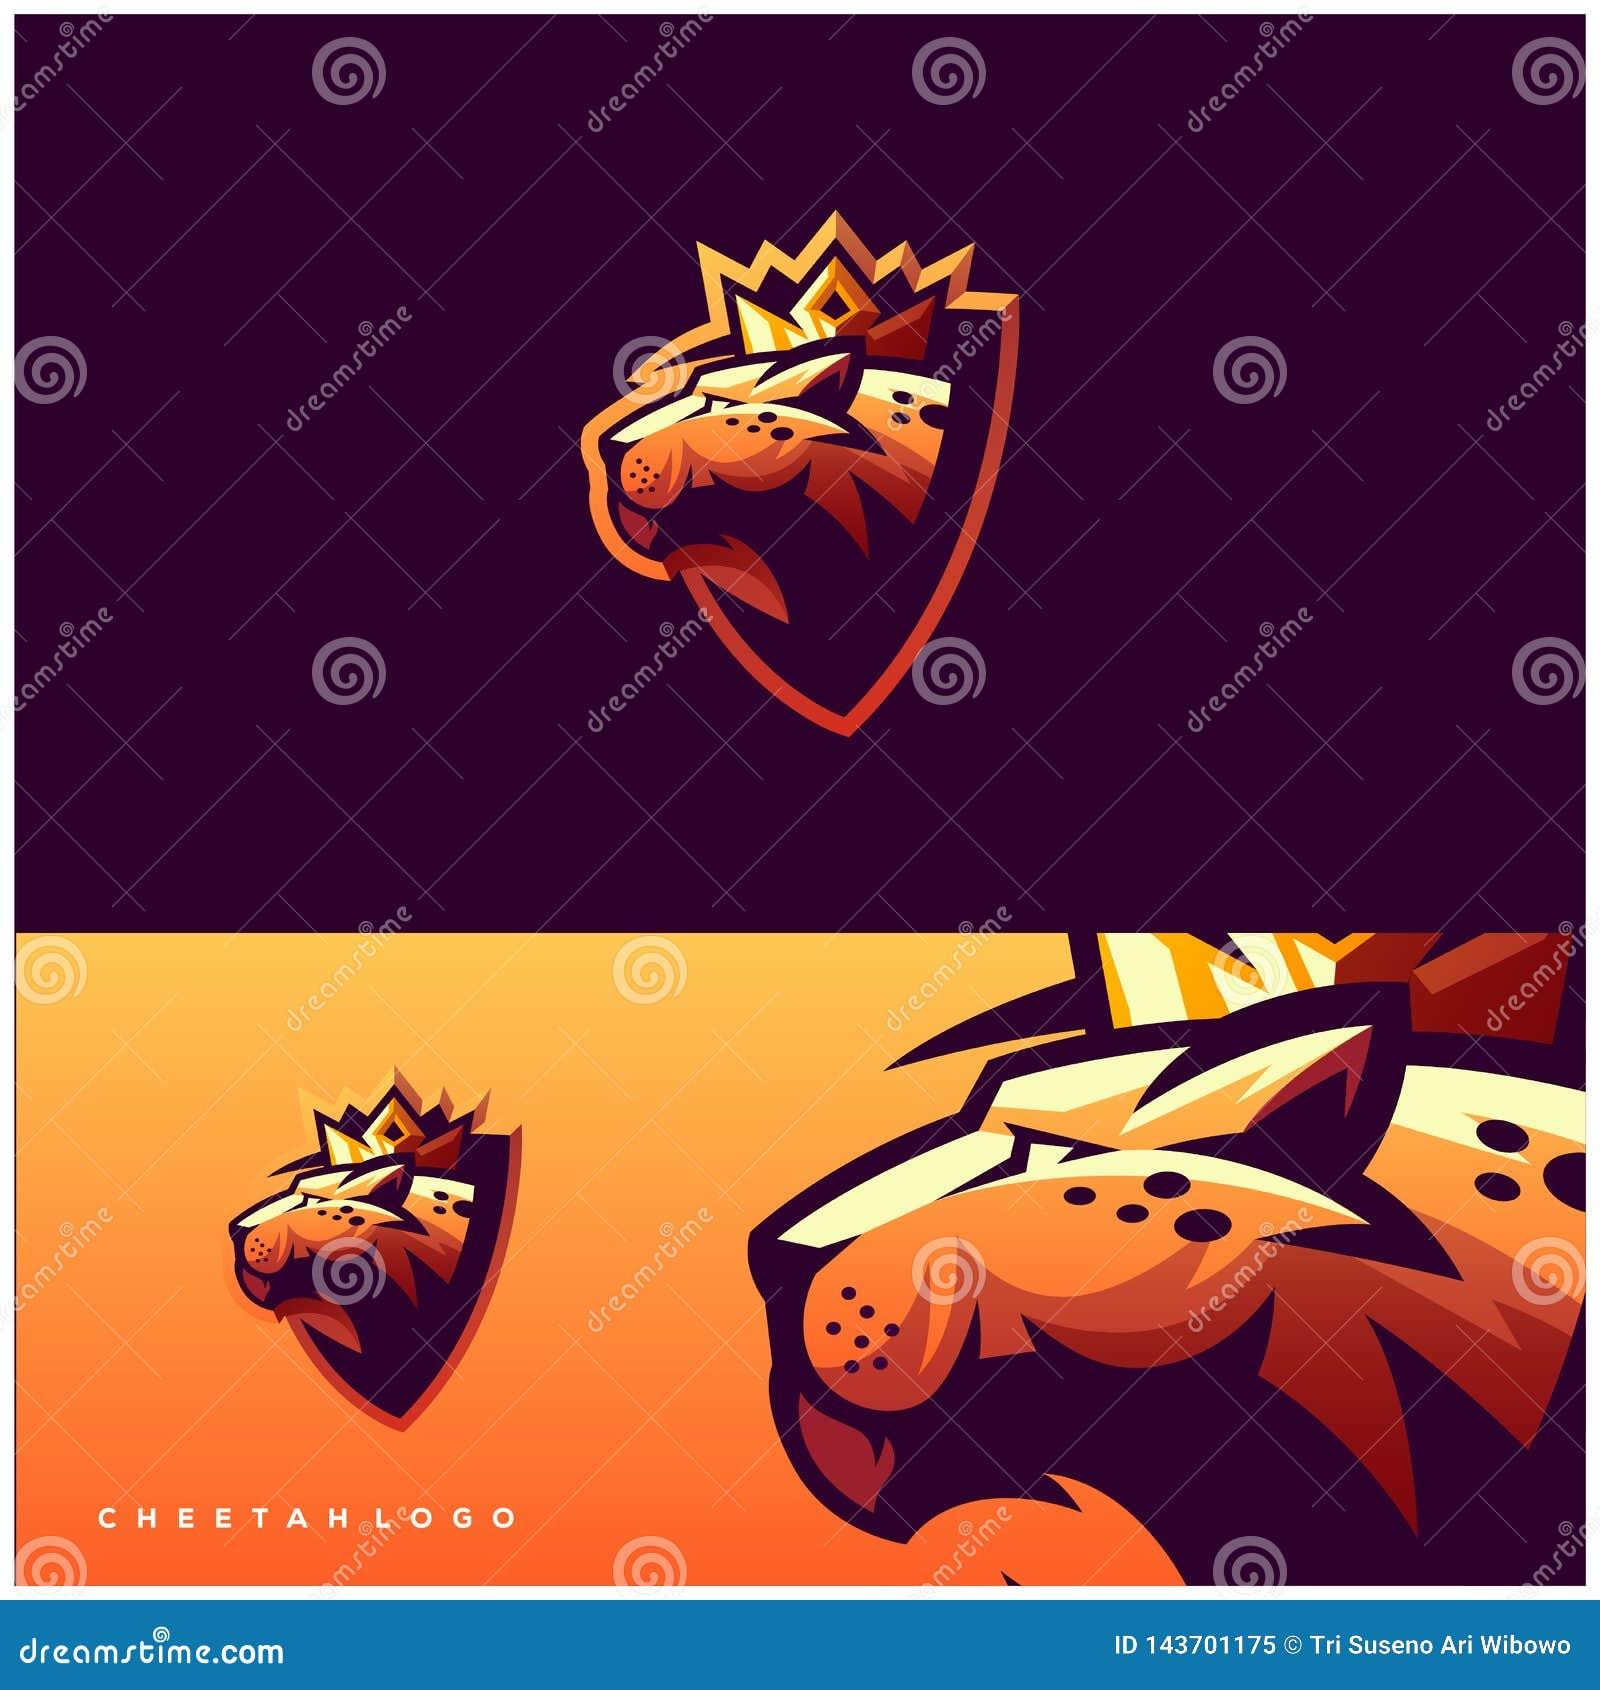 Cheetah logo design ready to use